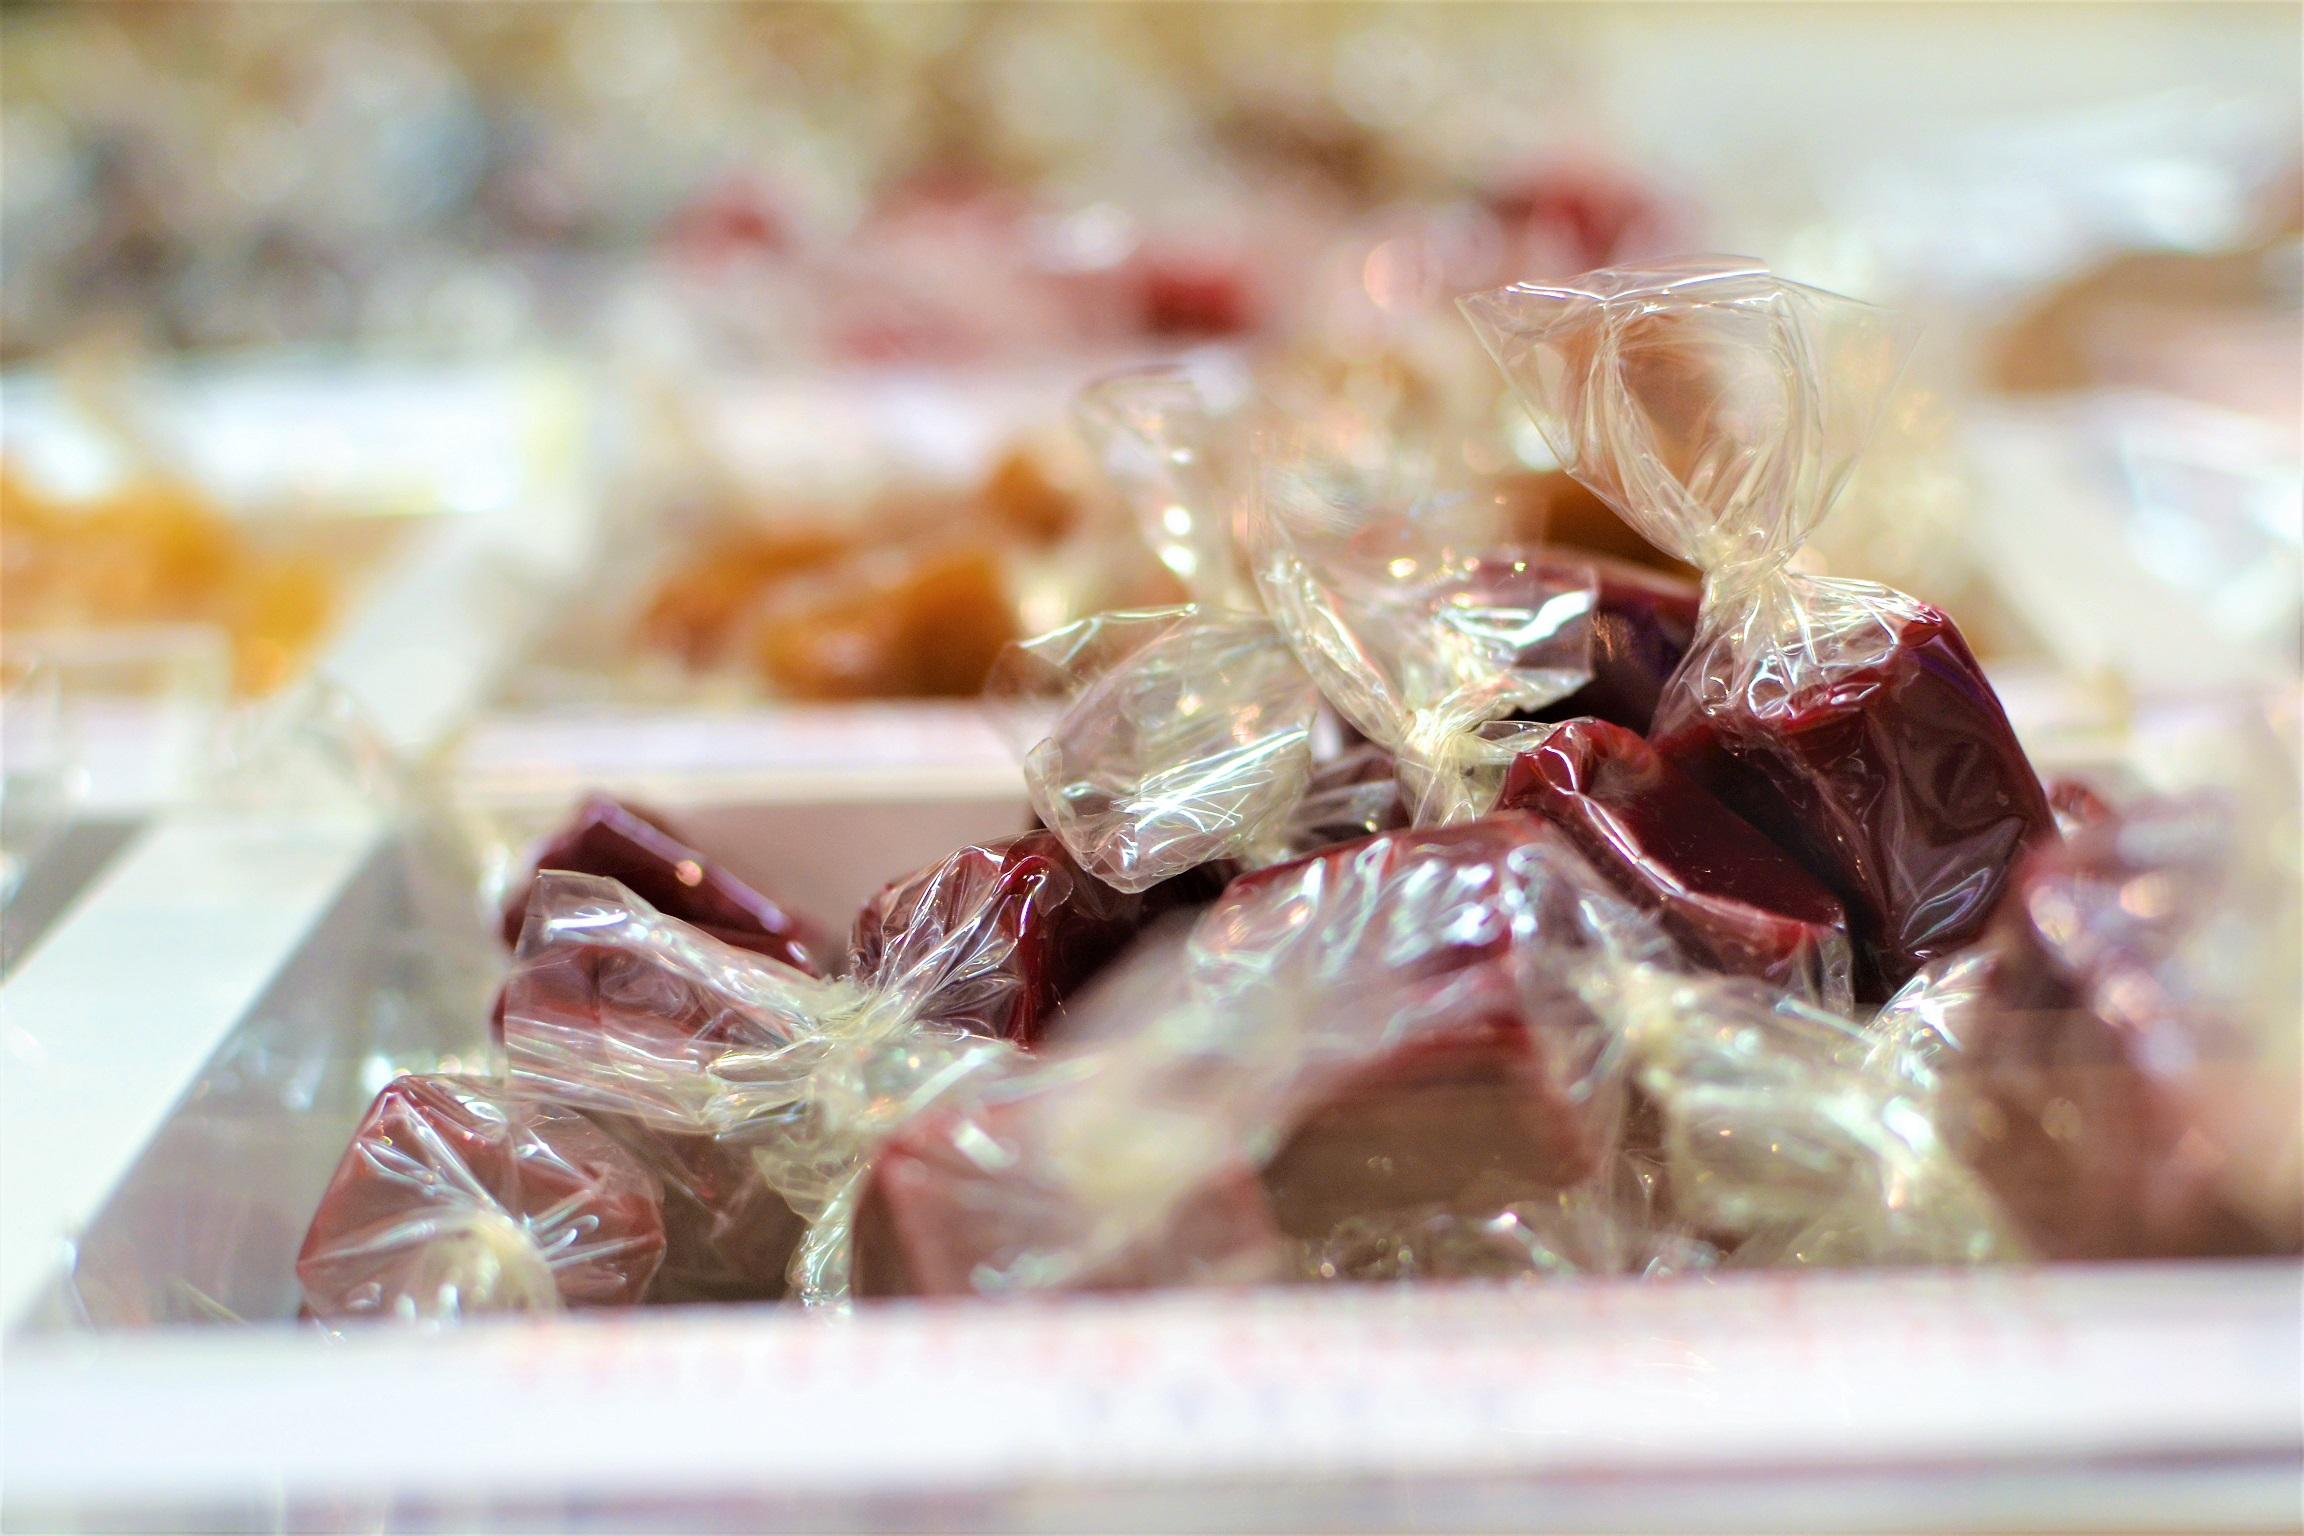 Paris toffee sweets